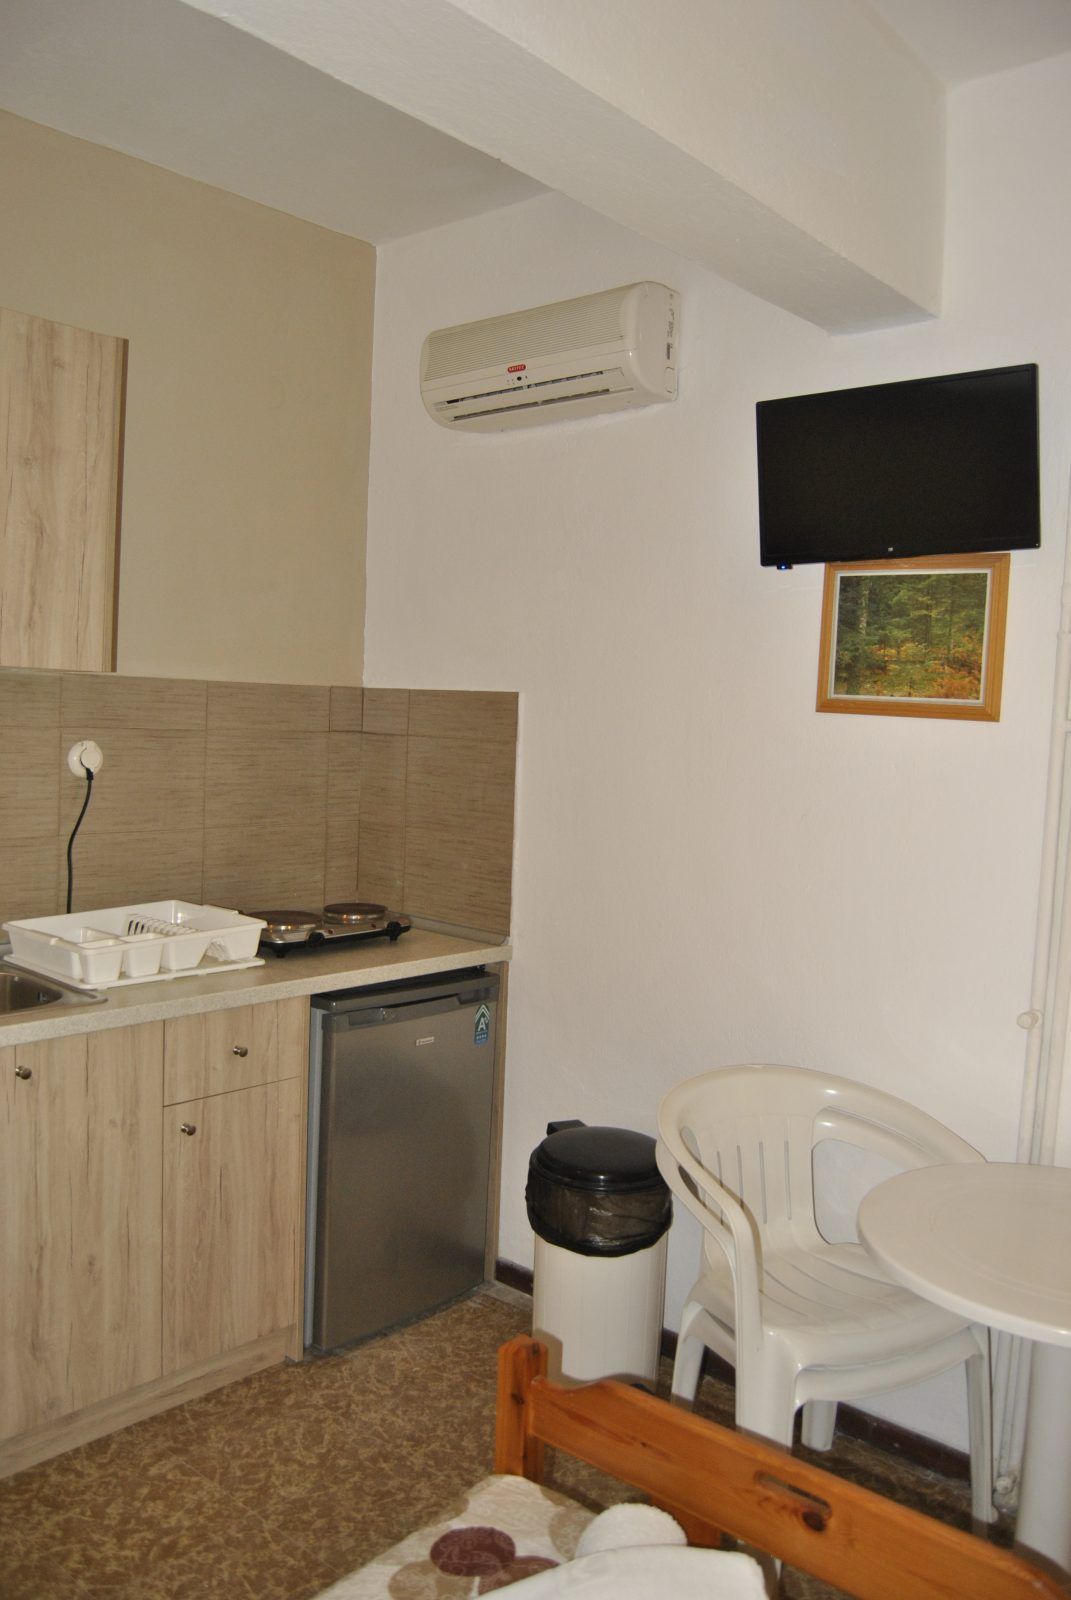 Grcka apartmani letovanje, Nea Flogita Halkidiki, Pirgioti, kuhinjski elementi